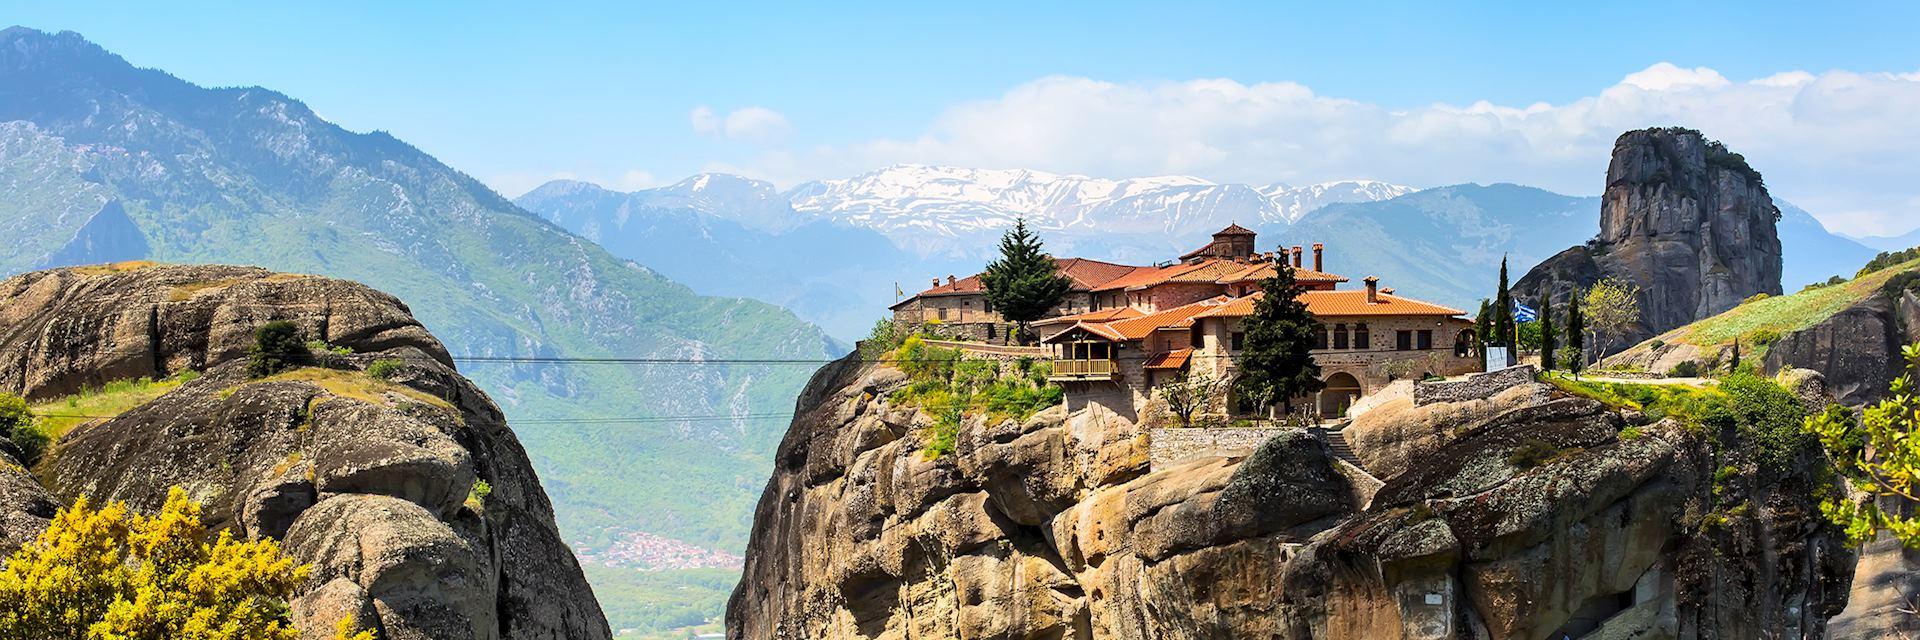 St Stefan Monastery, Meteora cliff